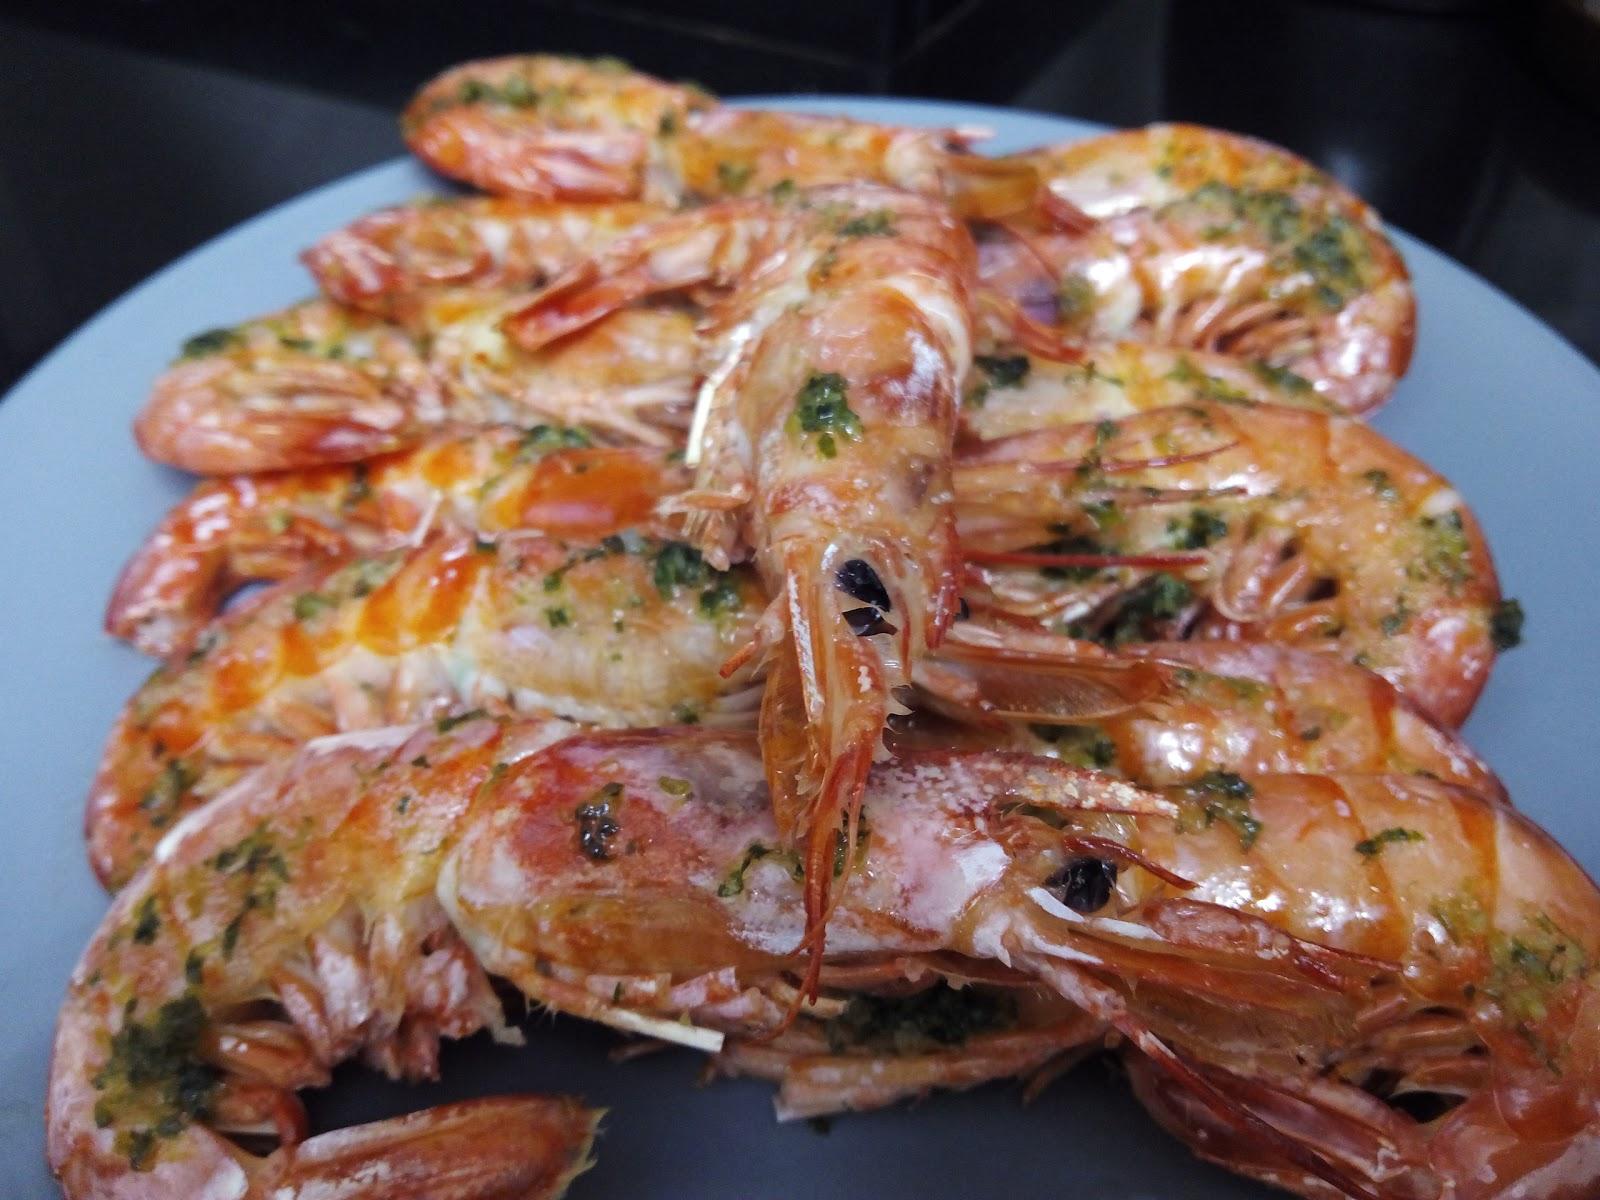 Cocina con rachel langostinos al horno - Racholas cocina ...